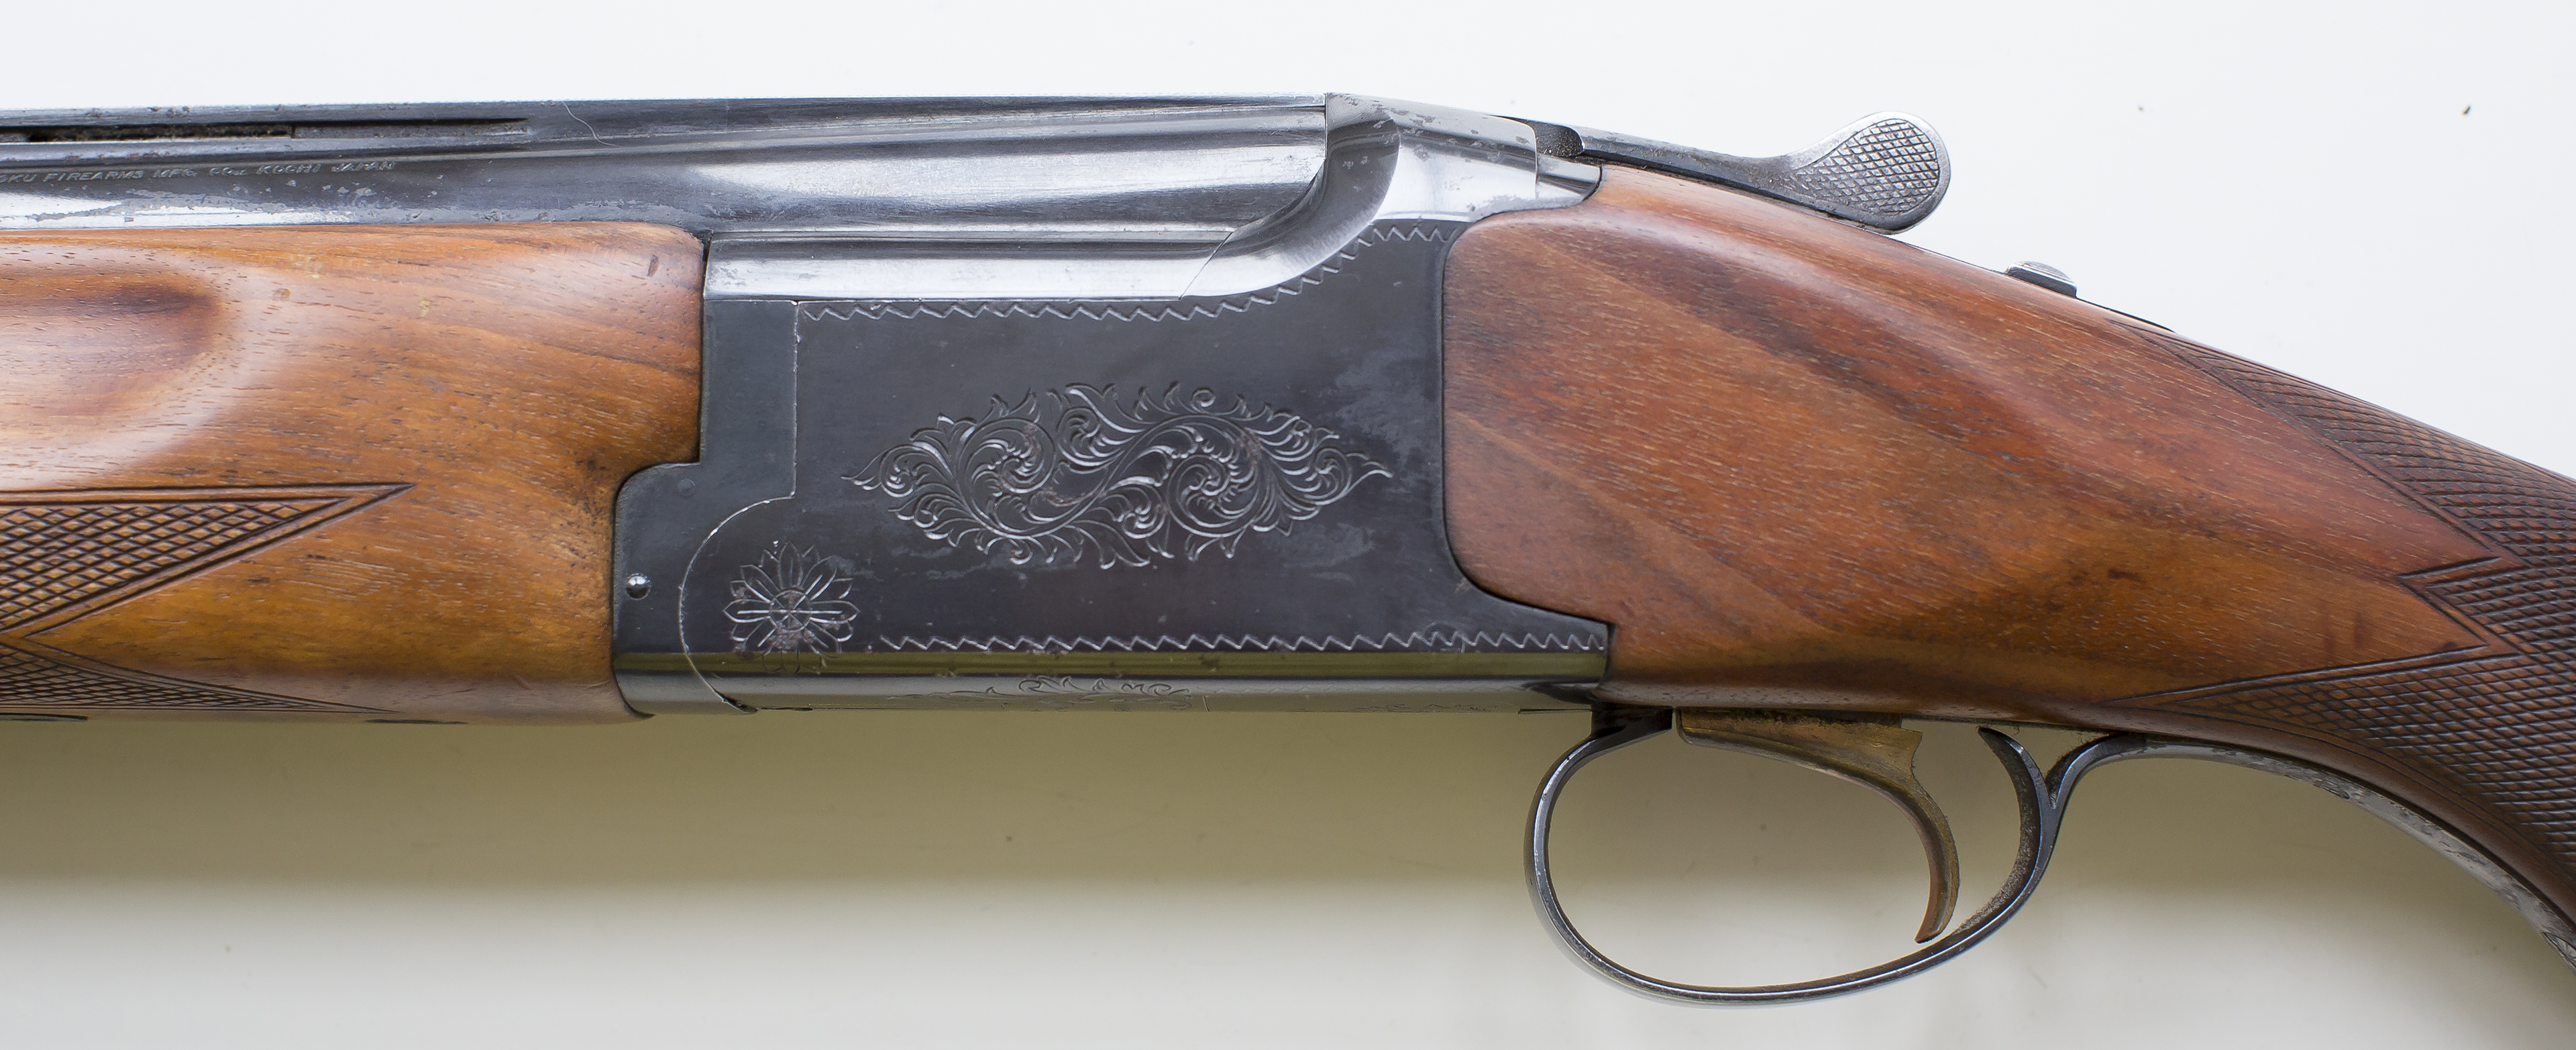 miroku shotgun serial number manufacture date